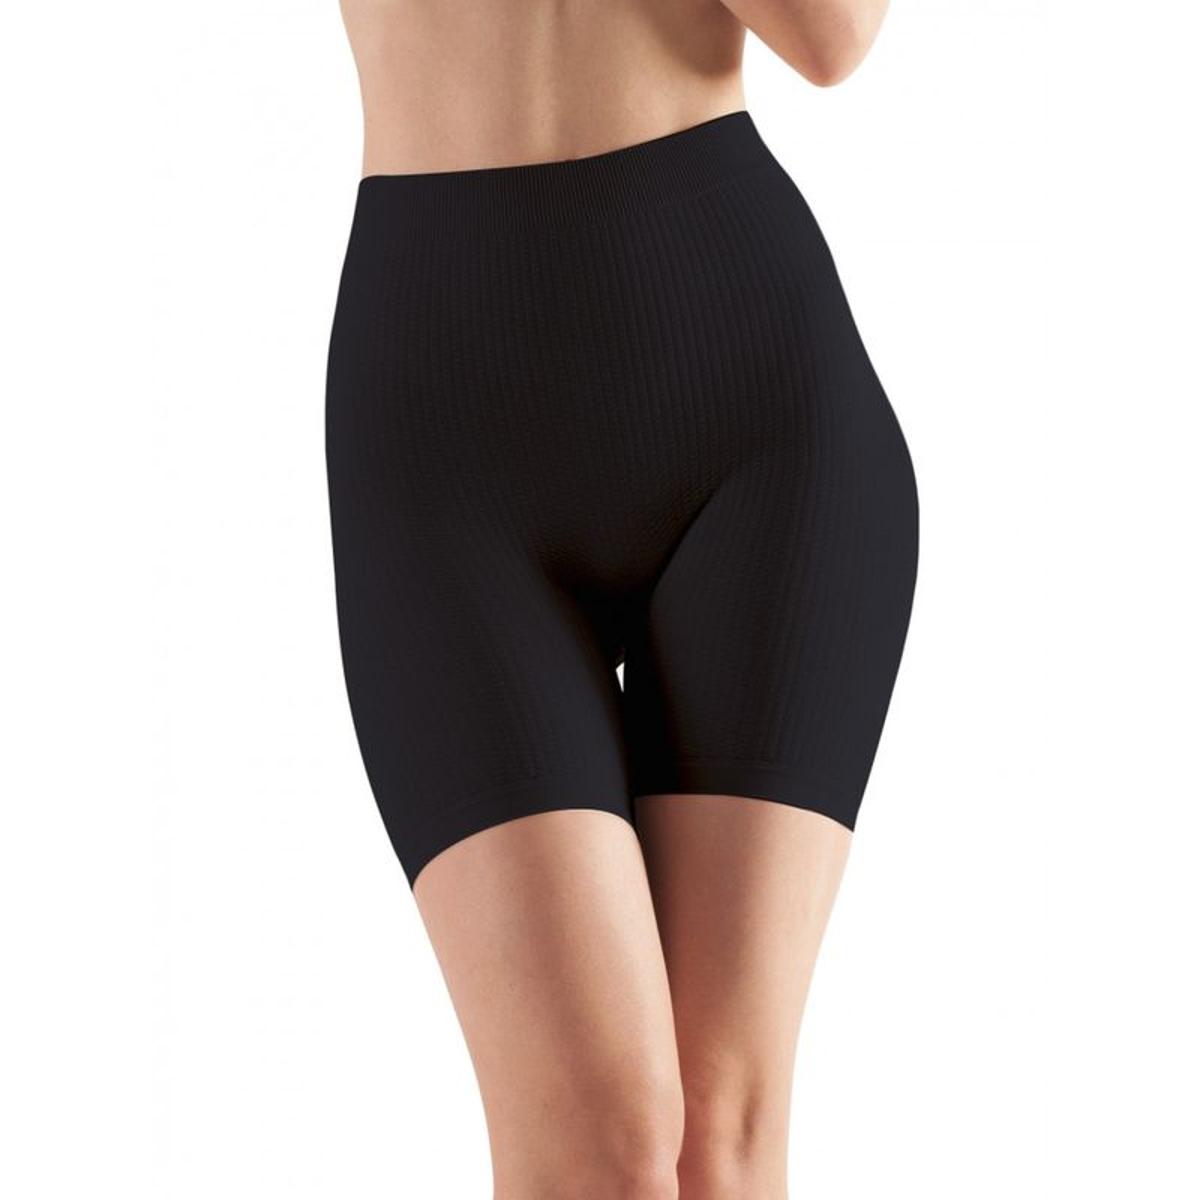 Panty Stop Cellulite Noir